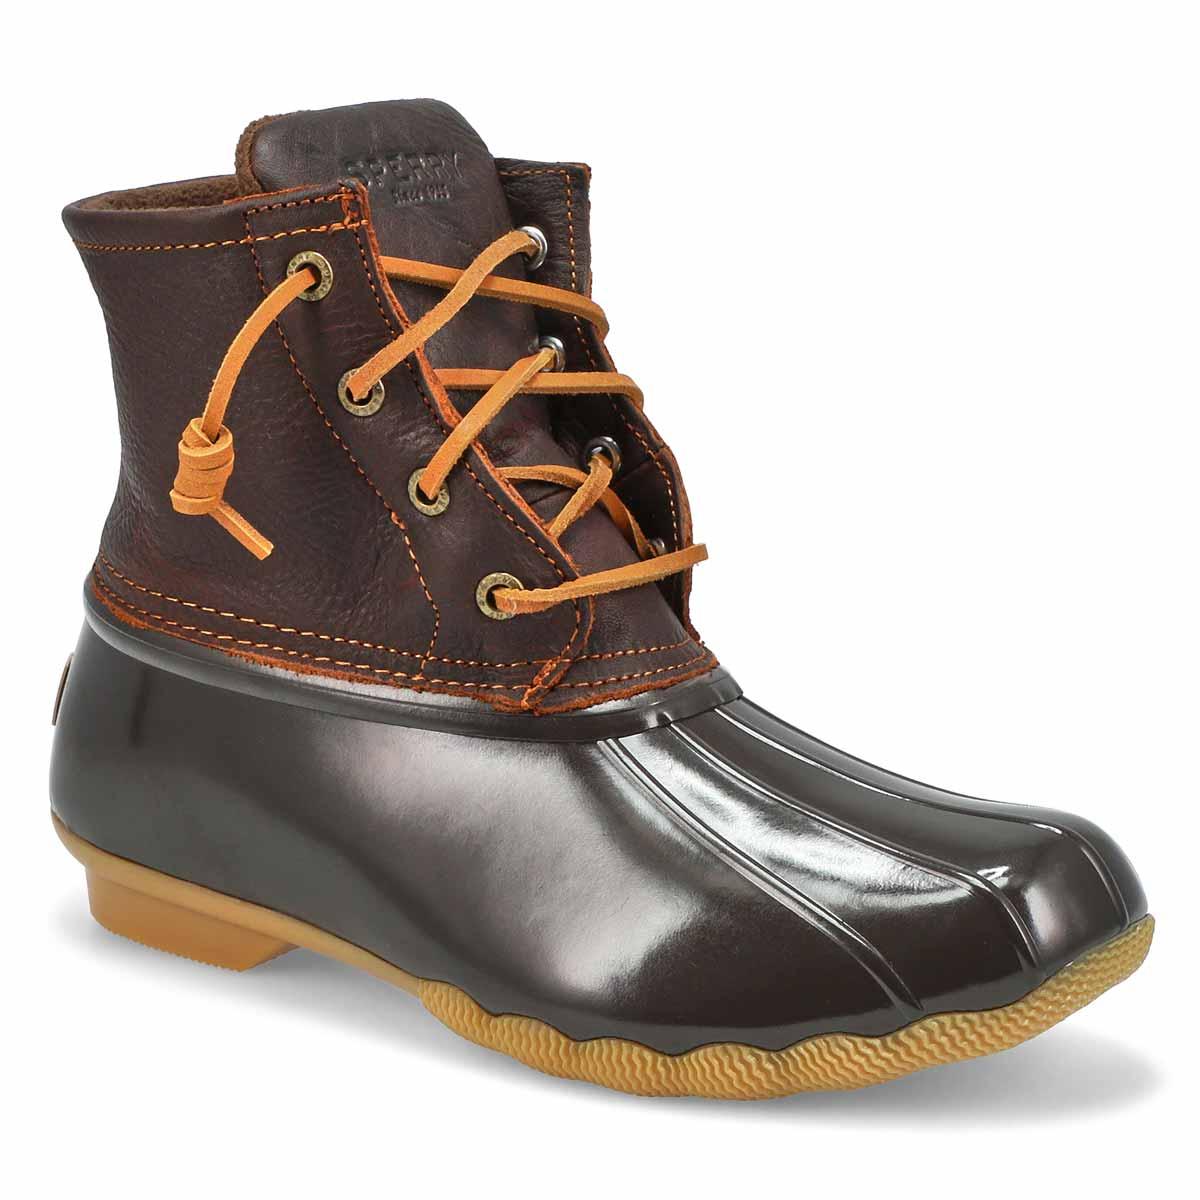 Lds Saltwater Core tan/brn low rain boot